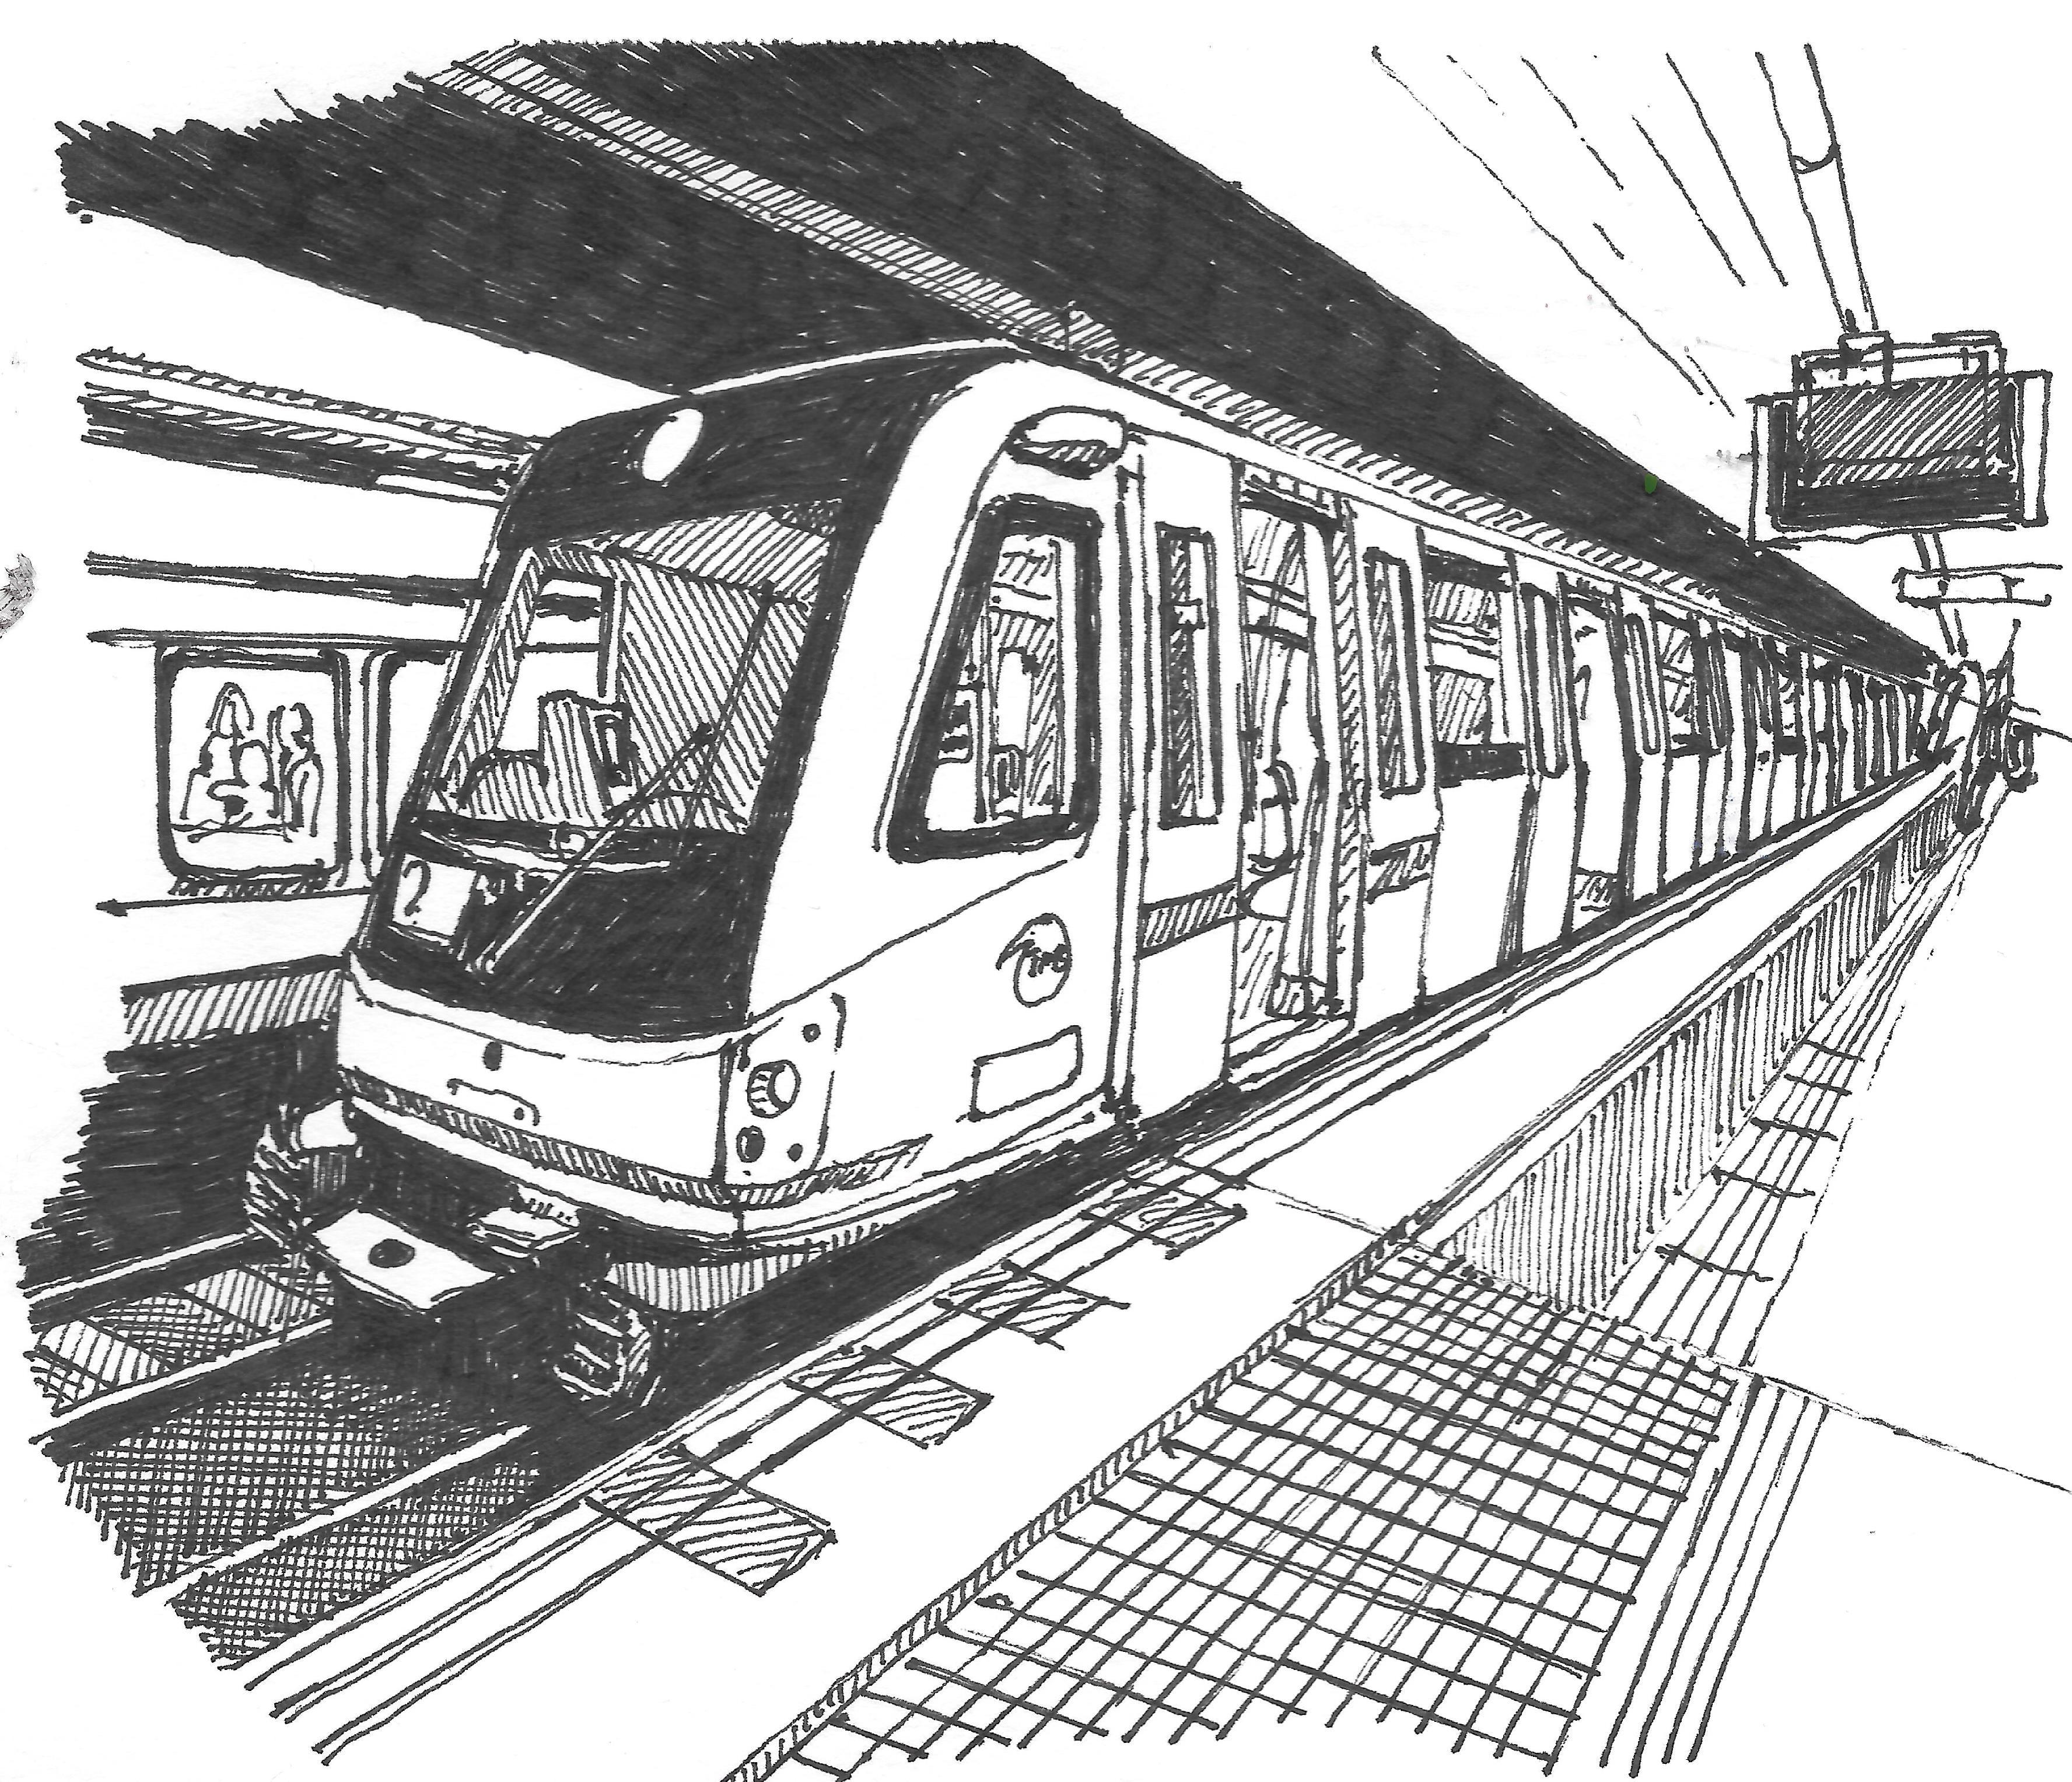 Barcelona Metro Sketched In 0 5mm Karakalem Cizimler Mimari Cizimler Cizim Rehberleri